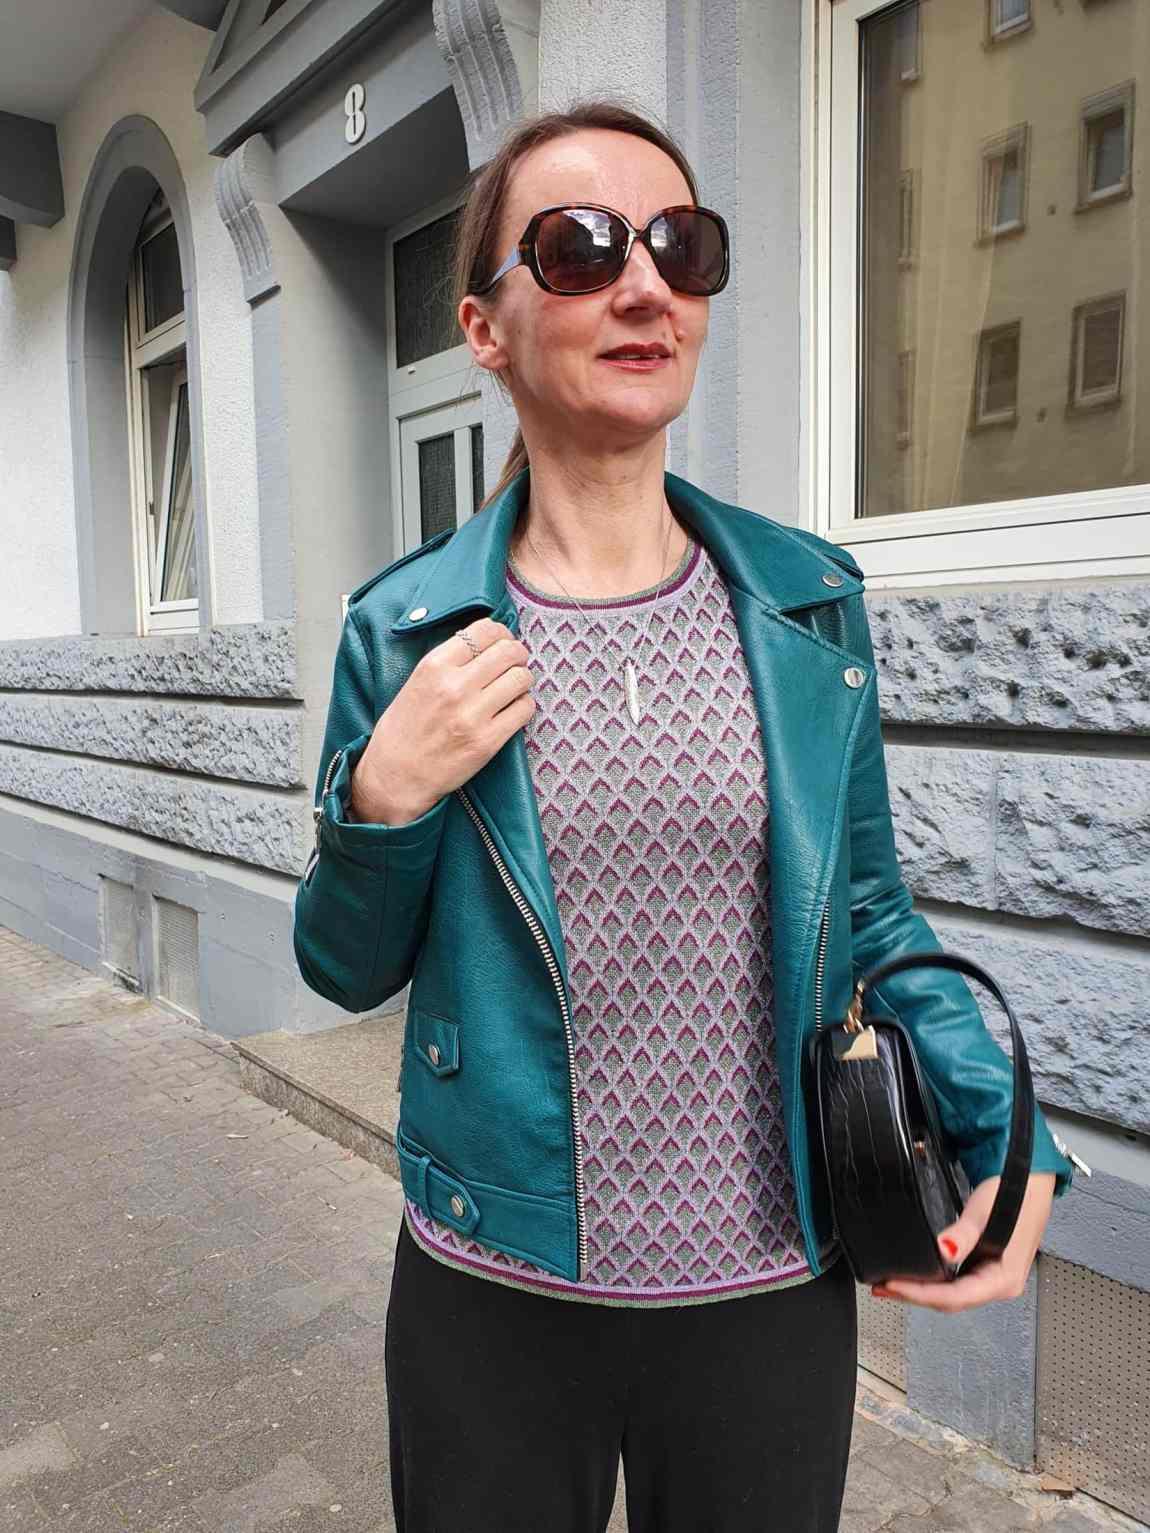 leder-jacke-damen-culottes_tatort_blog-ue50-oceanblue-style.jpg